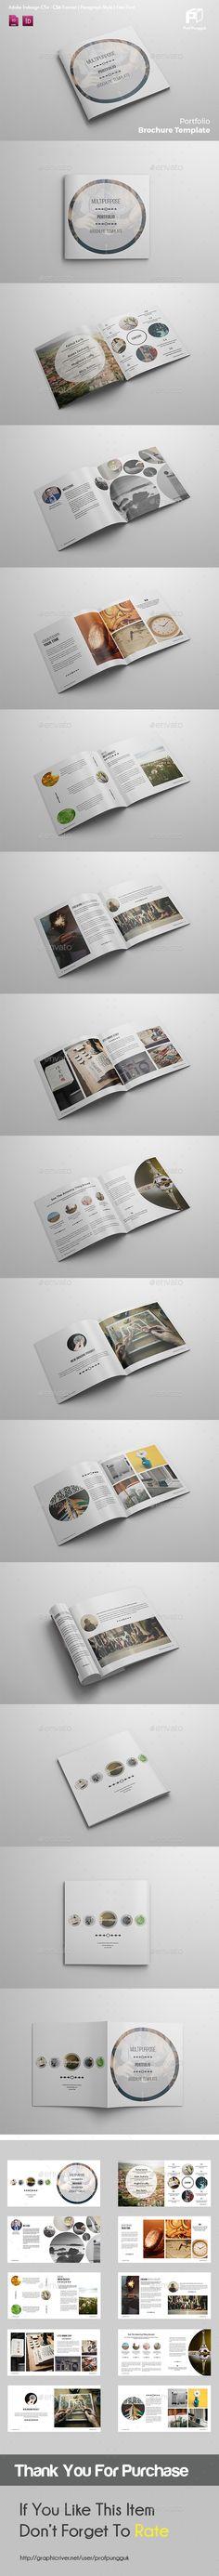 Hotel Metro Trifold Brochure Brochures, Brochure template and - hotel brochure template